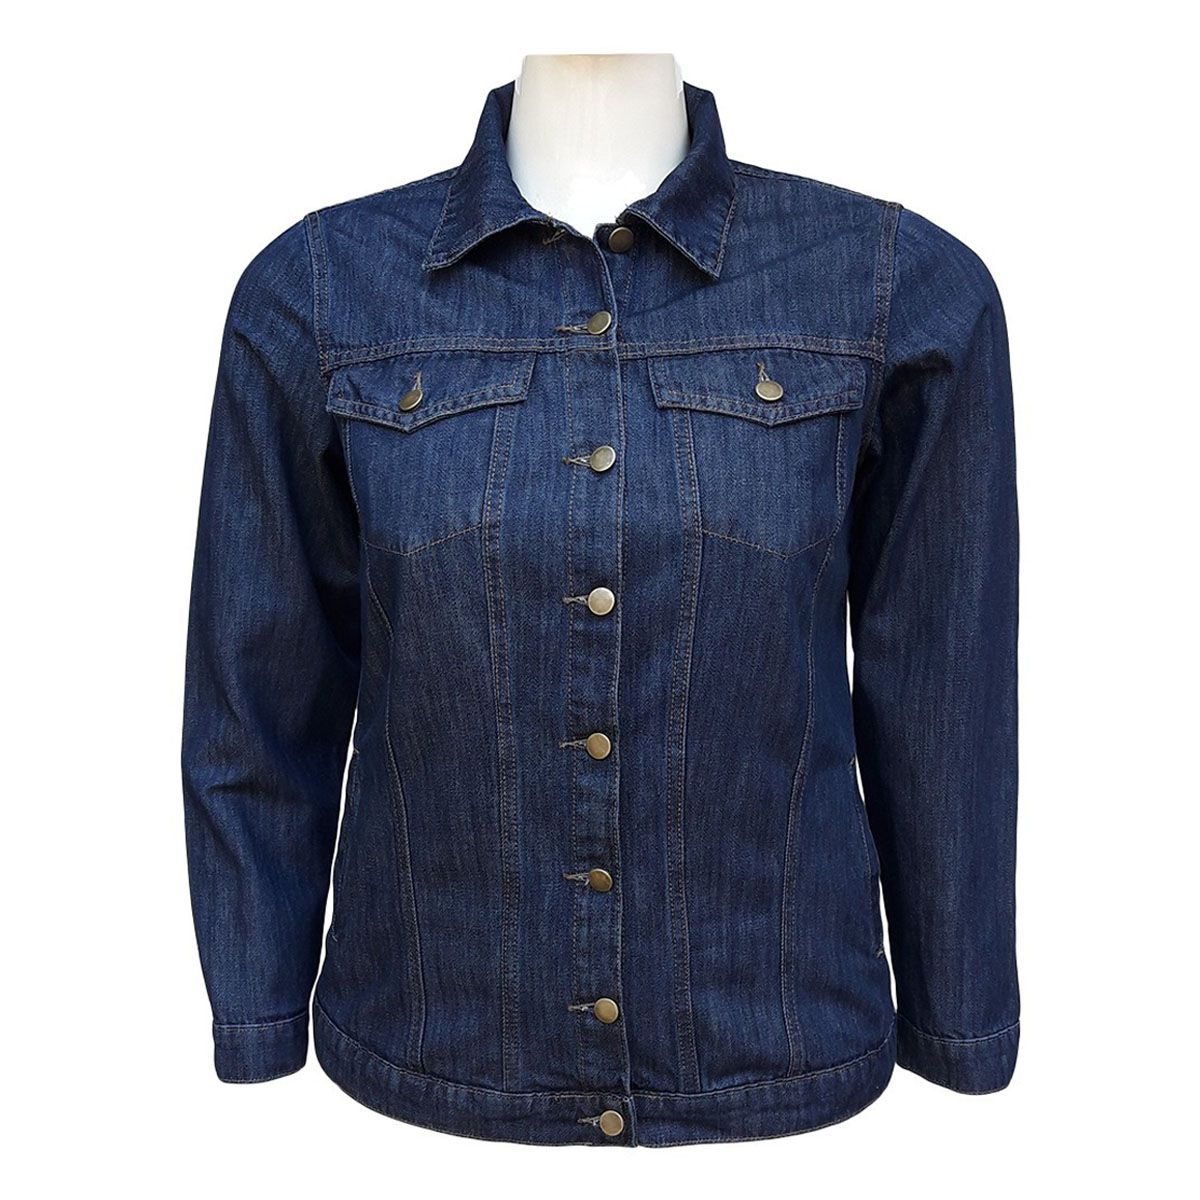 Jaqueta Jeans Feminina Oversized Plus Size